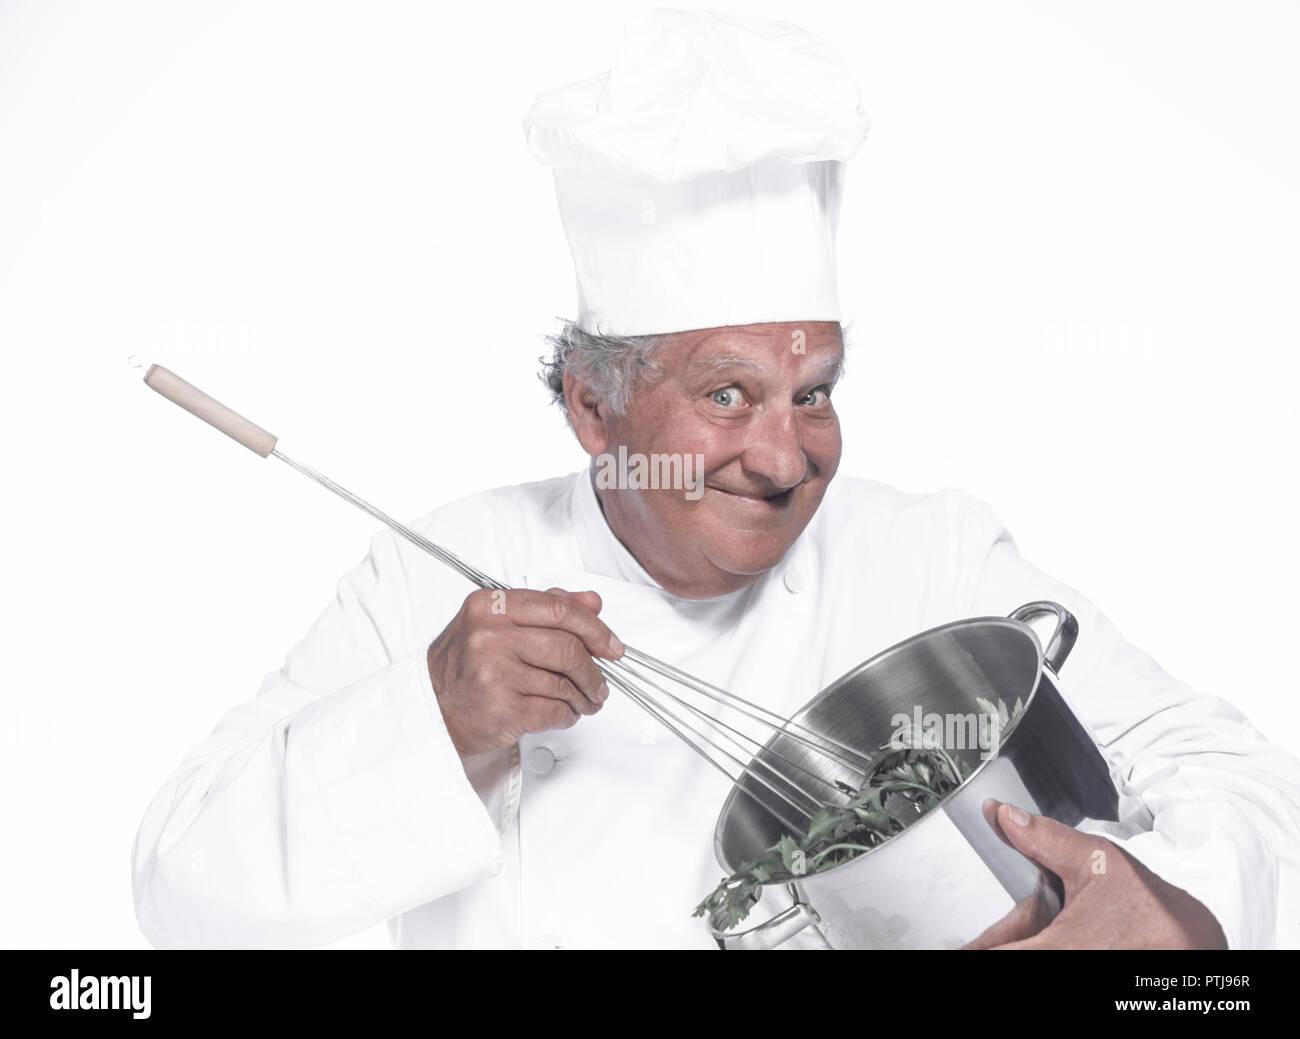 Aelterer Koch ruehrt in einem Kochtopf (Modellfreigabe) Stock Photo